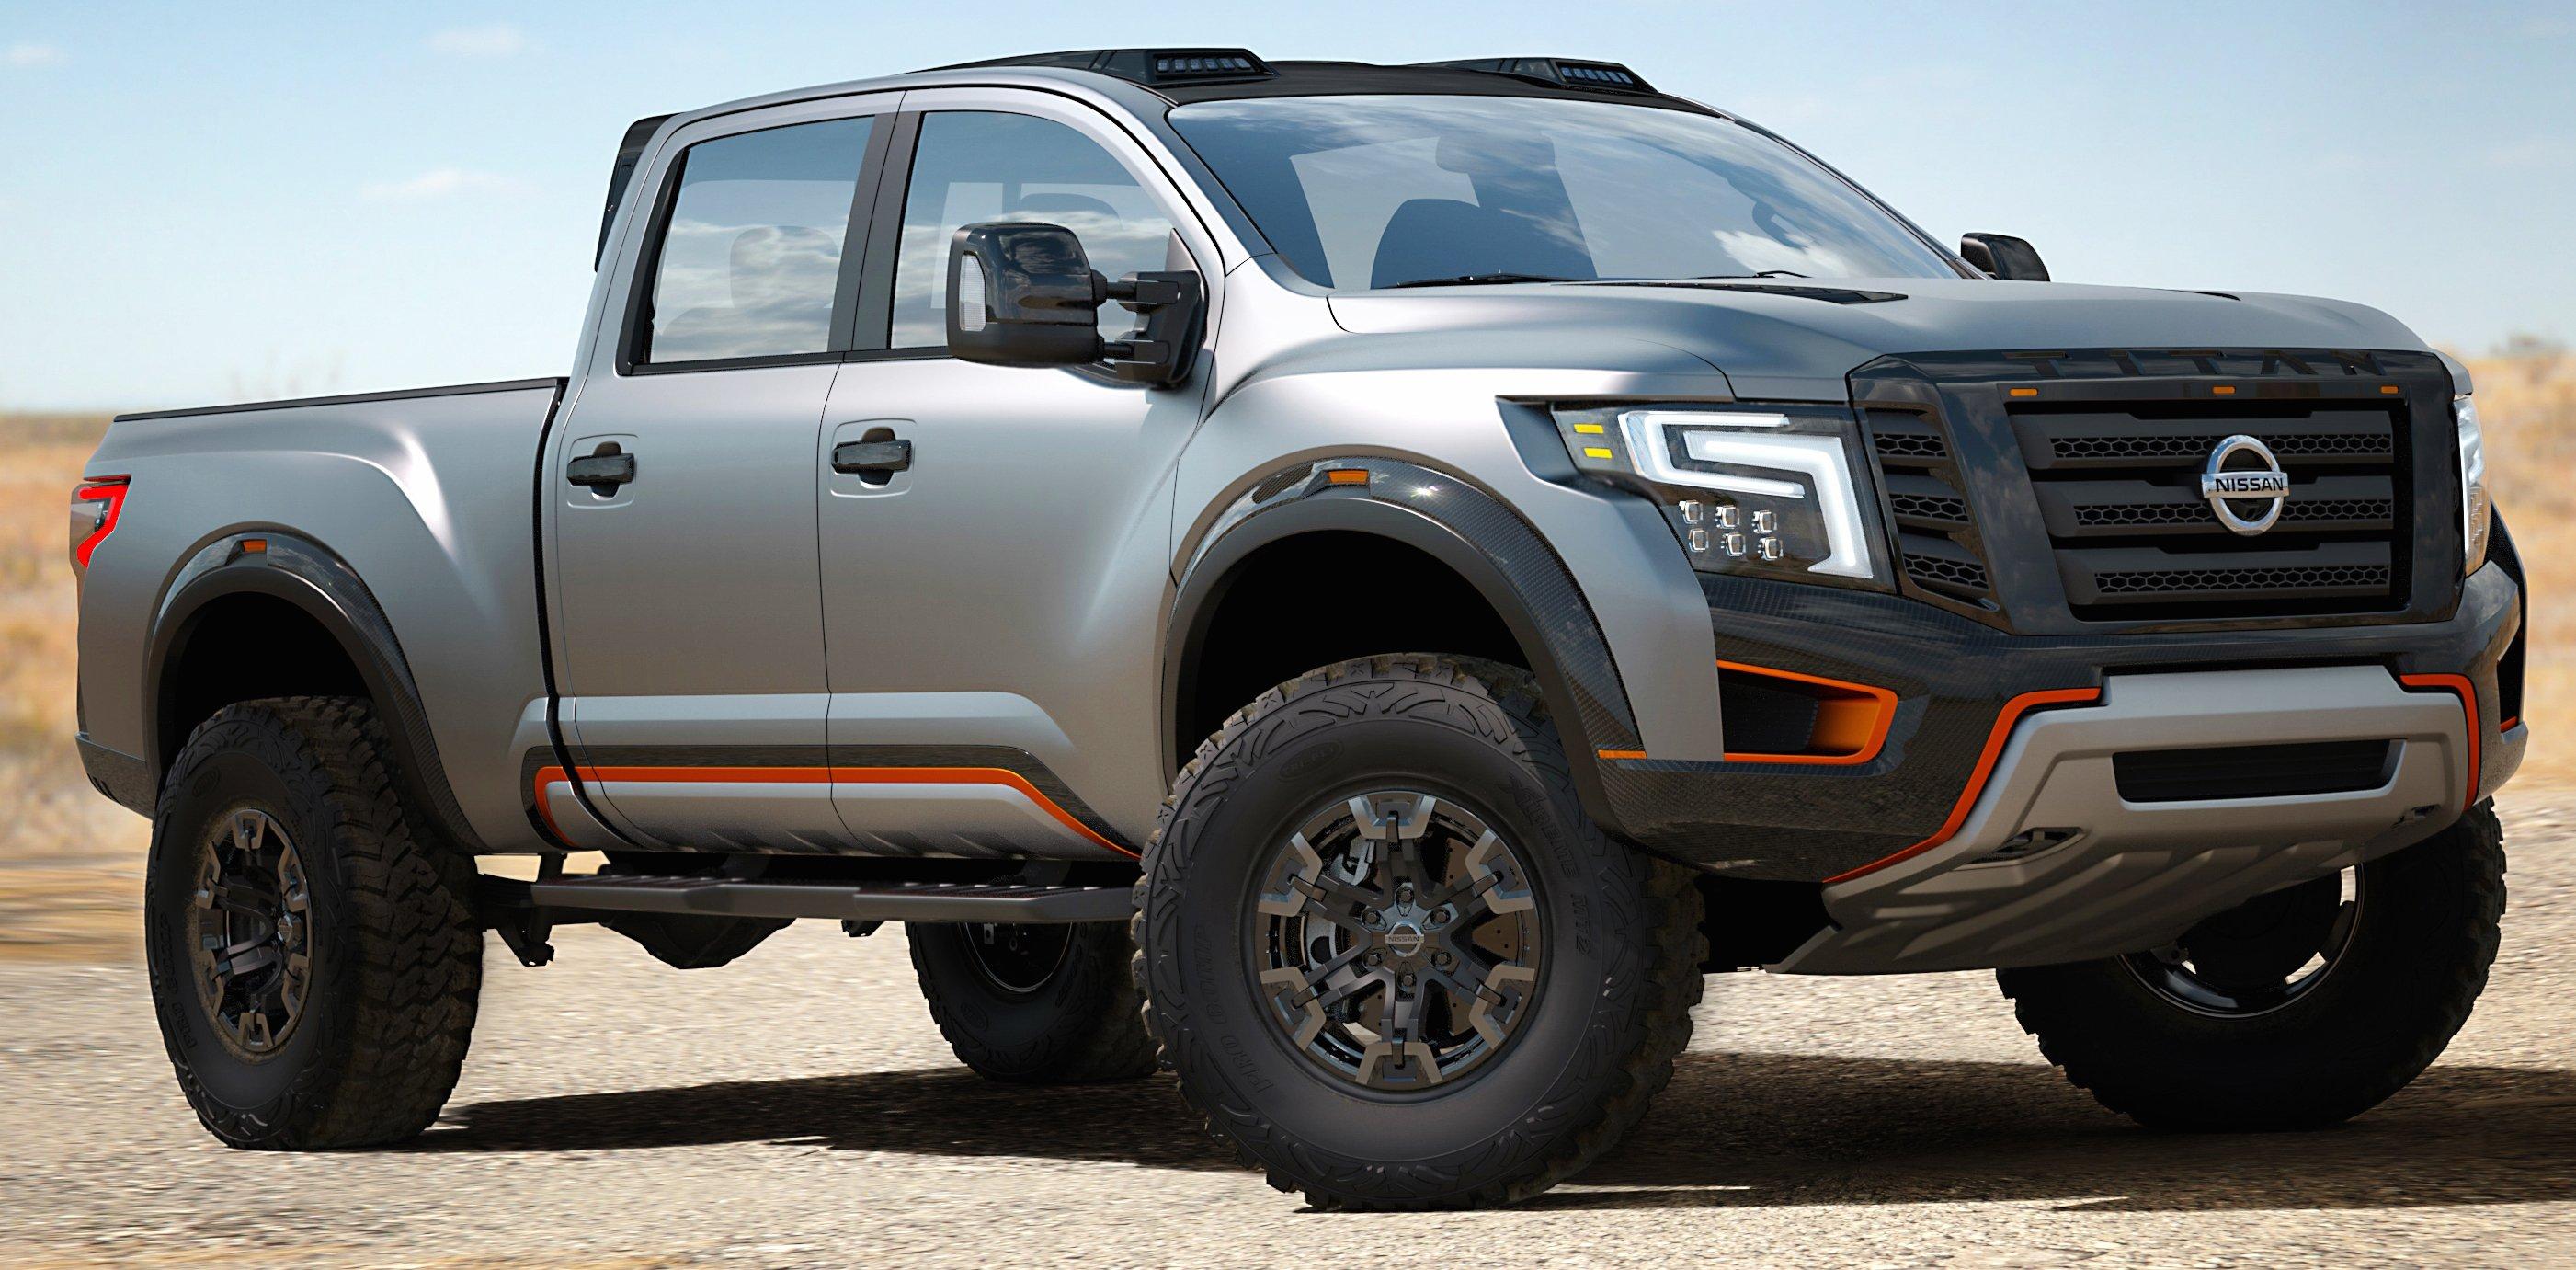 Nissan 2018 >> Nissan Titan Warrior Concept could make production Image ...